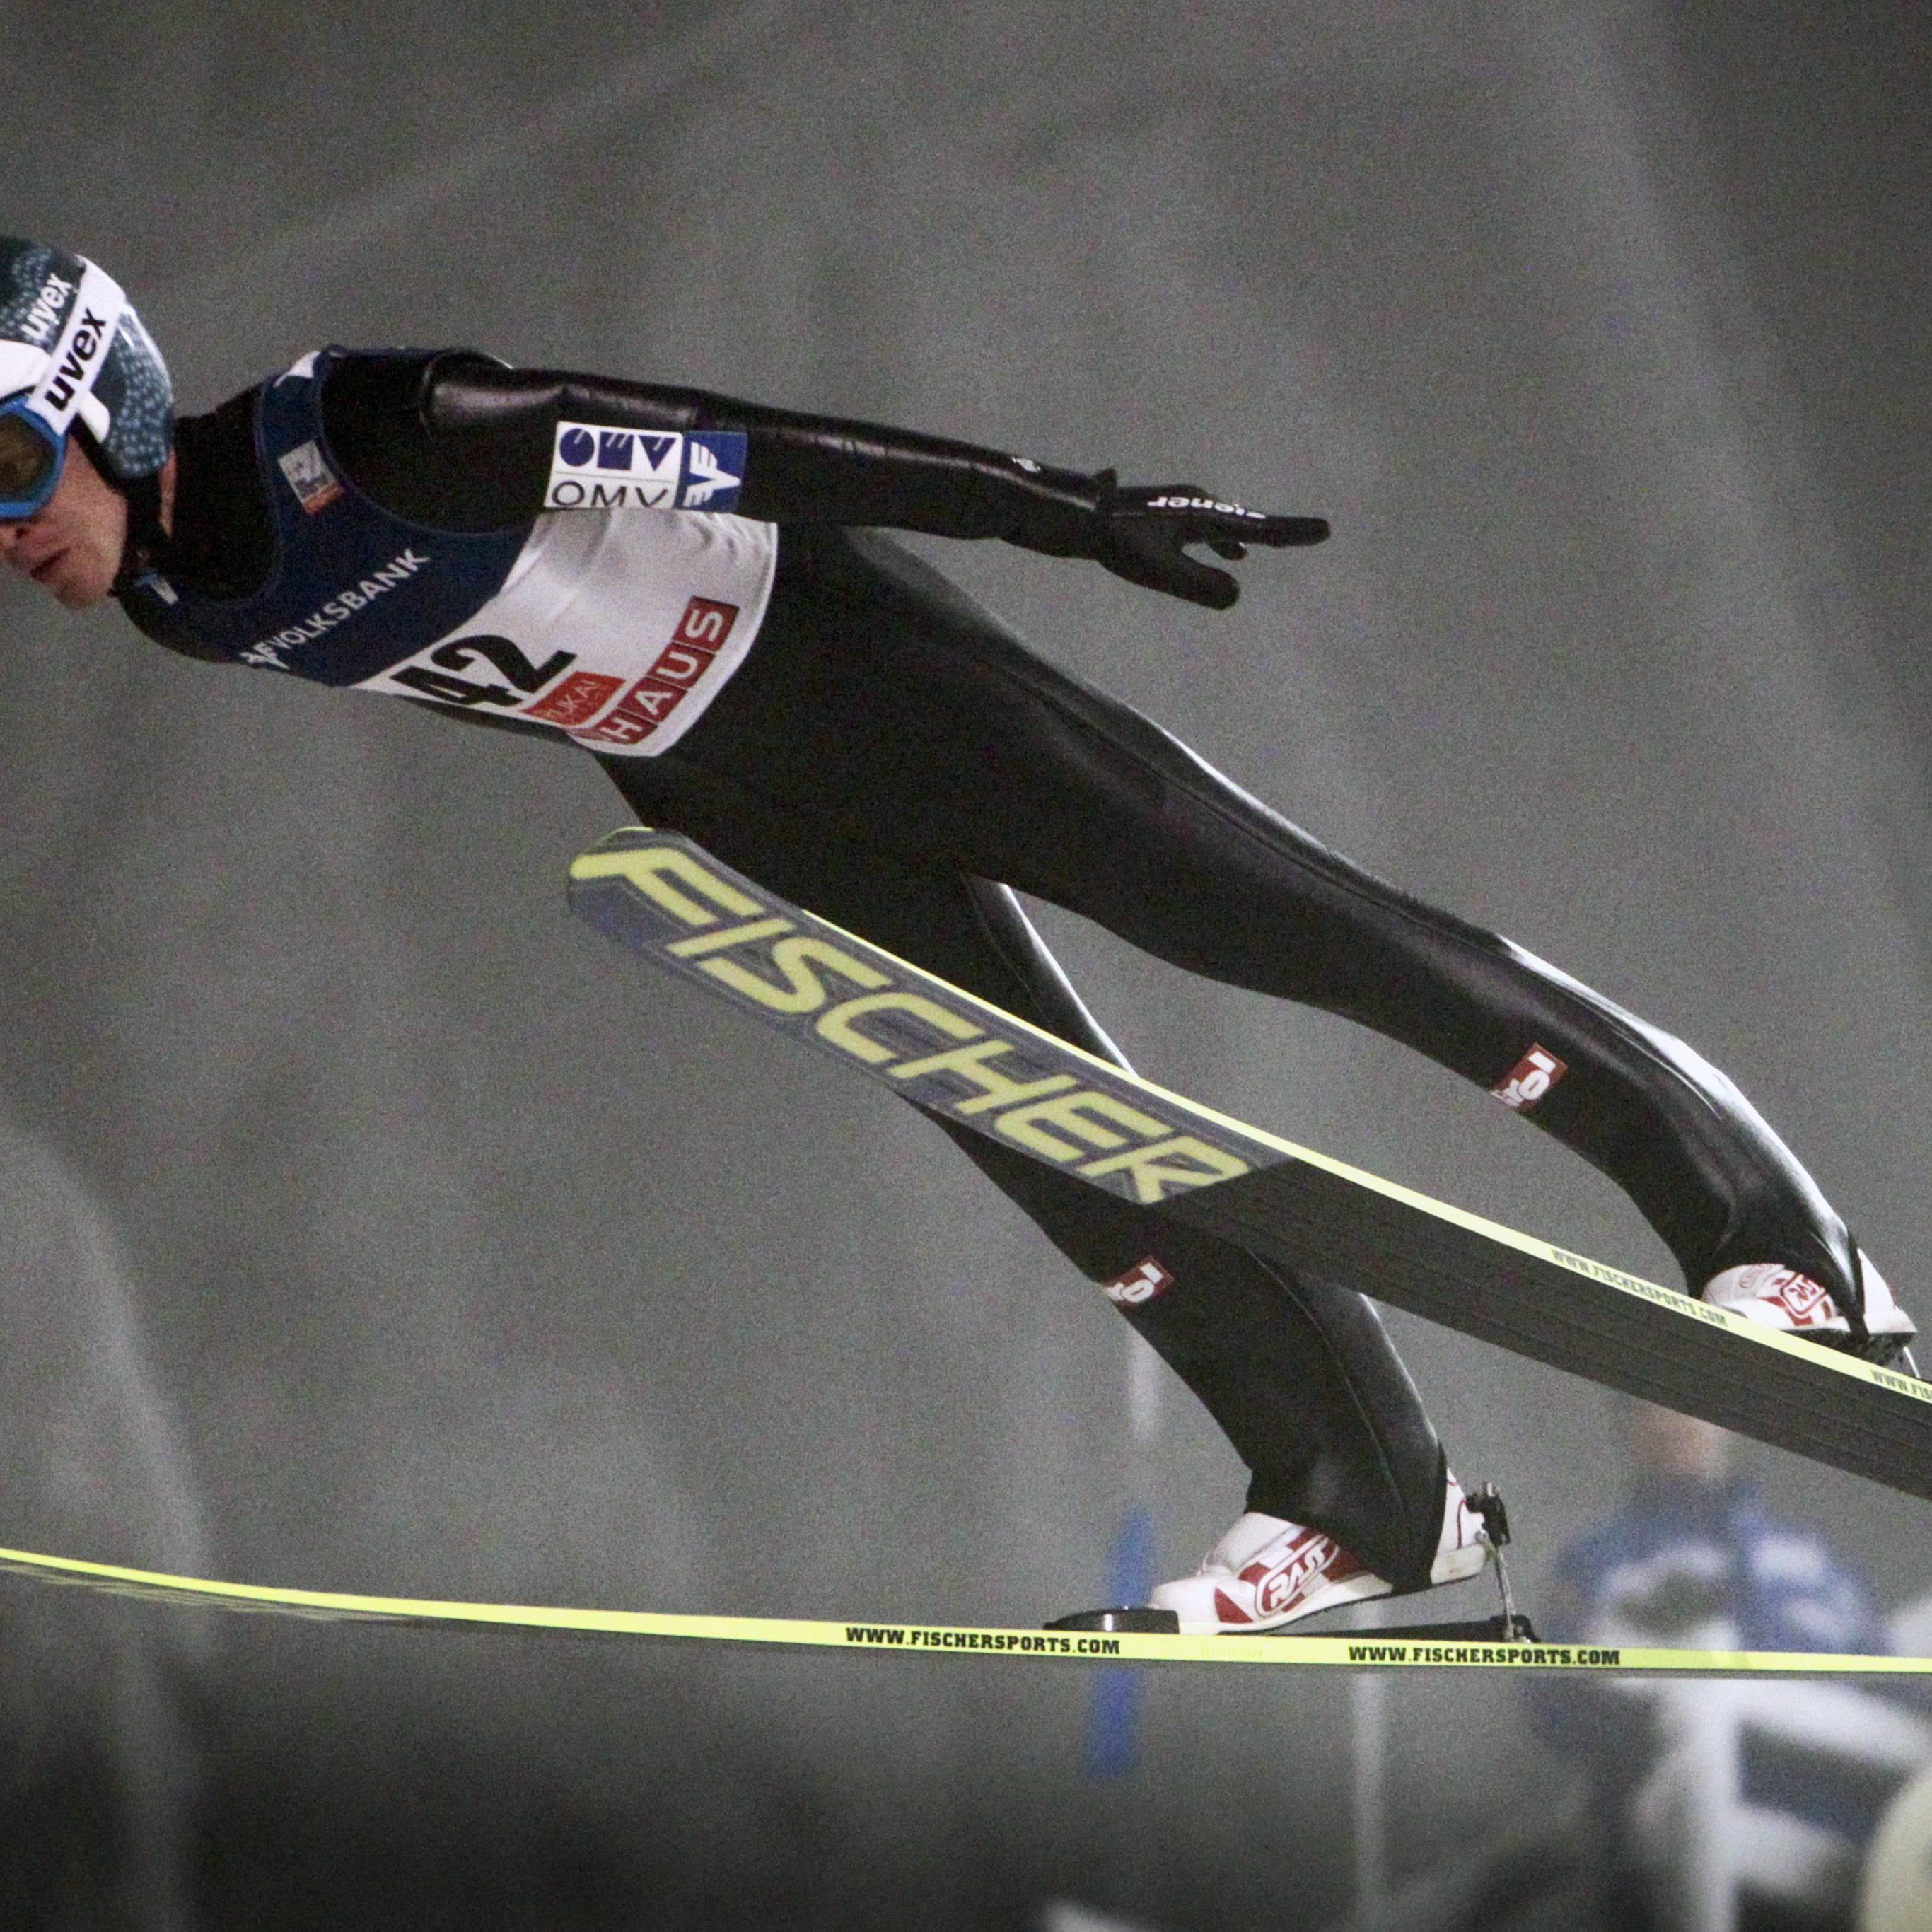 Ruka: Hayböck als bester ÖSV-Athlet auf Platz 5.